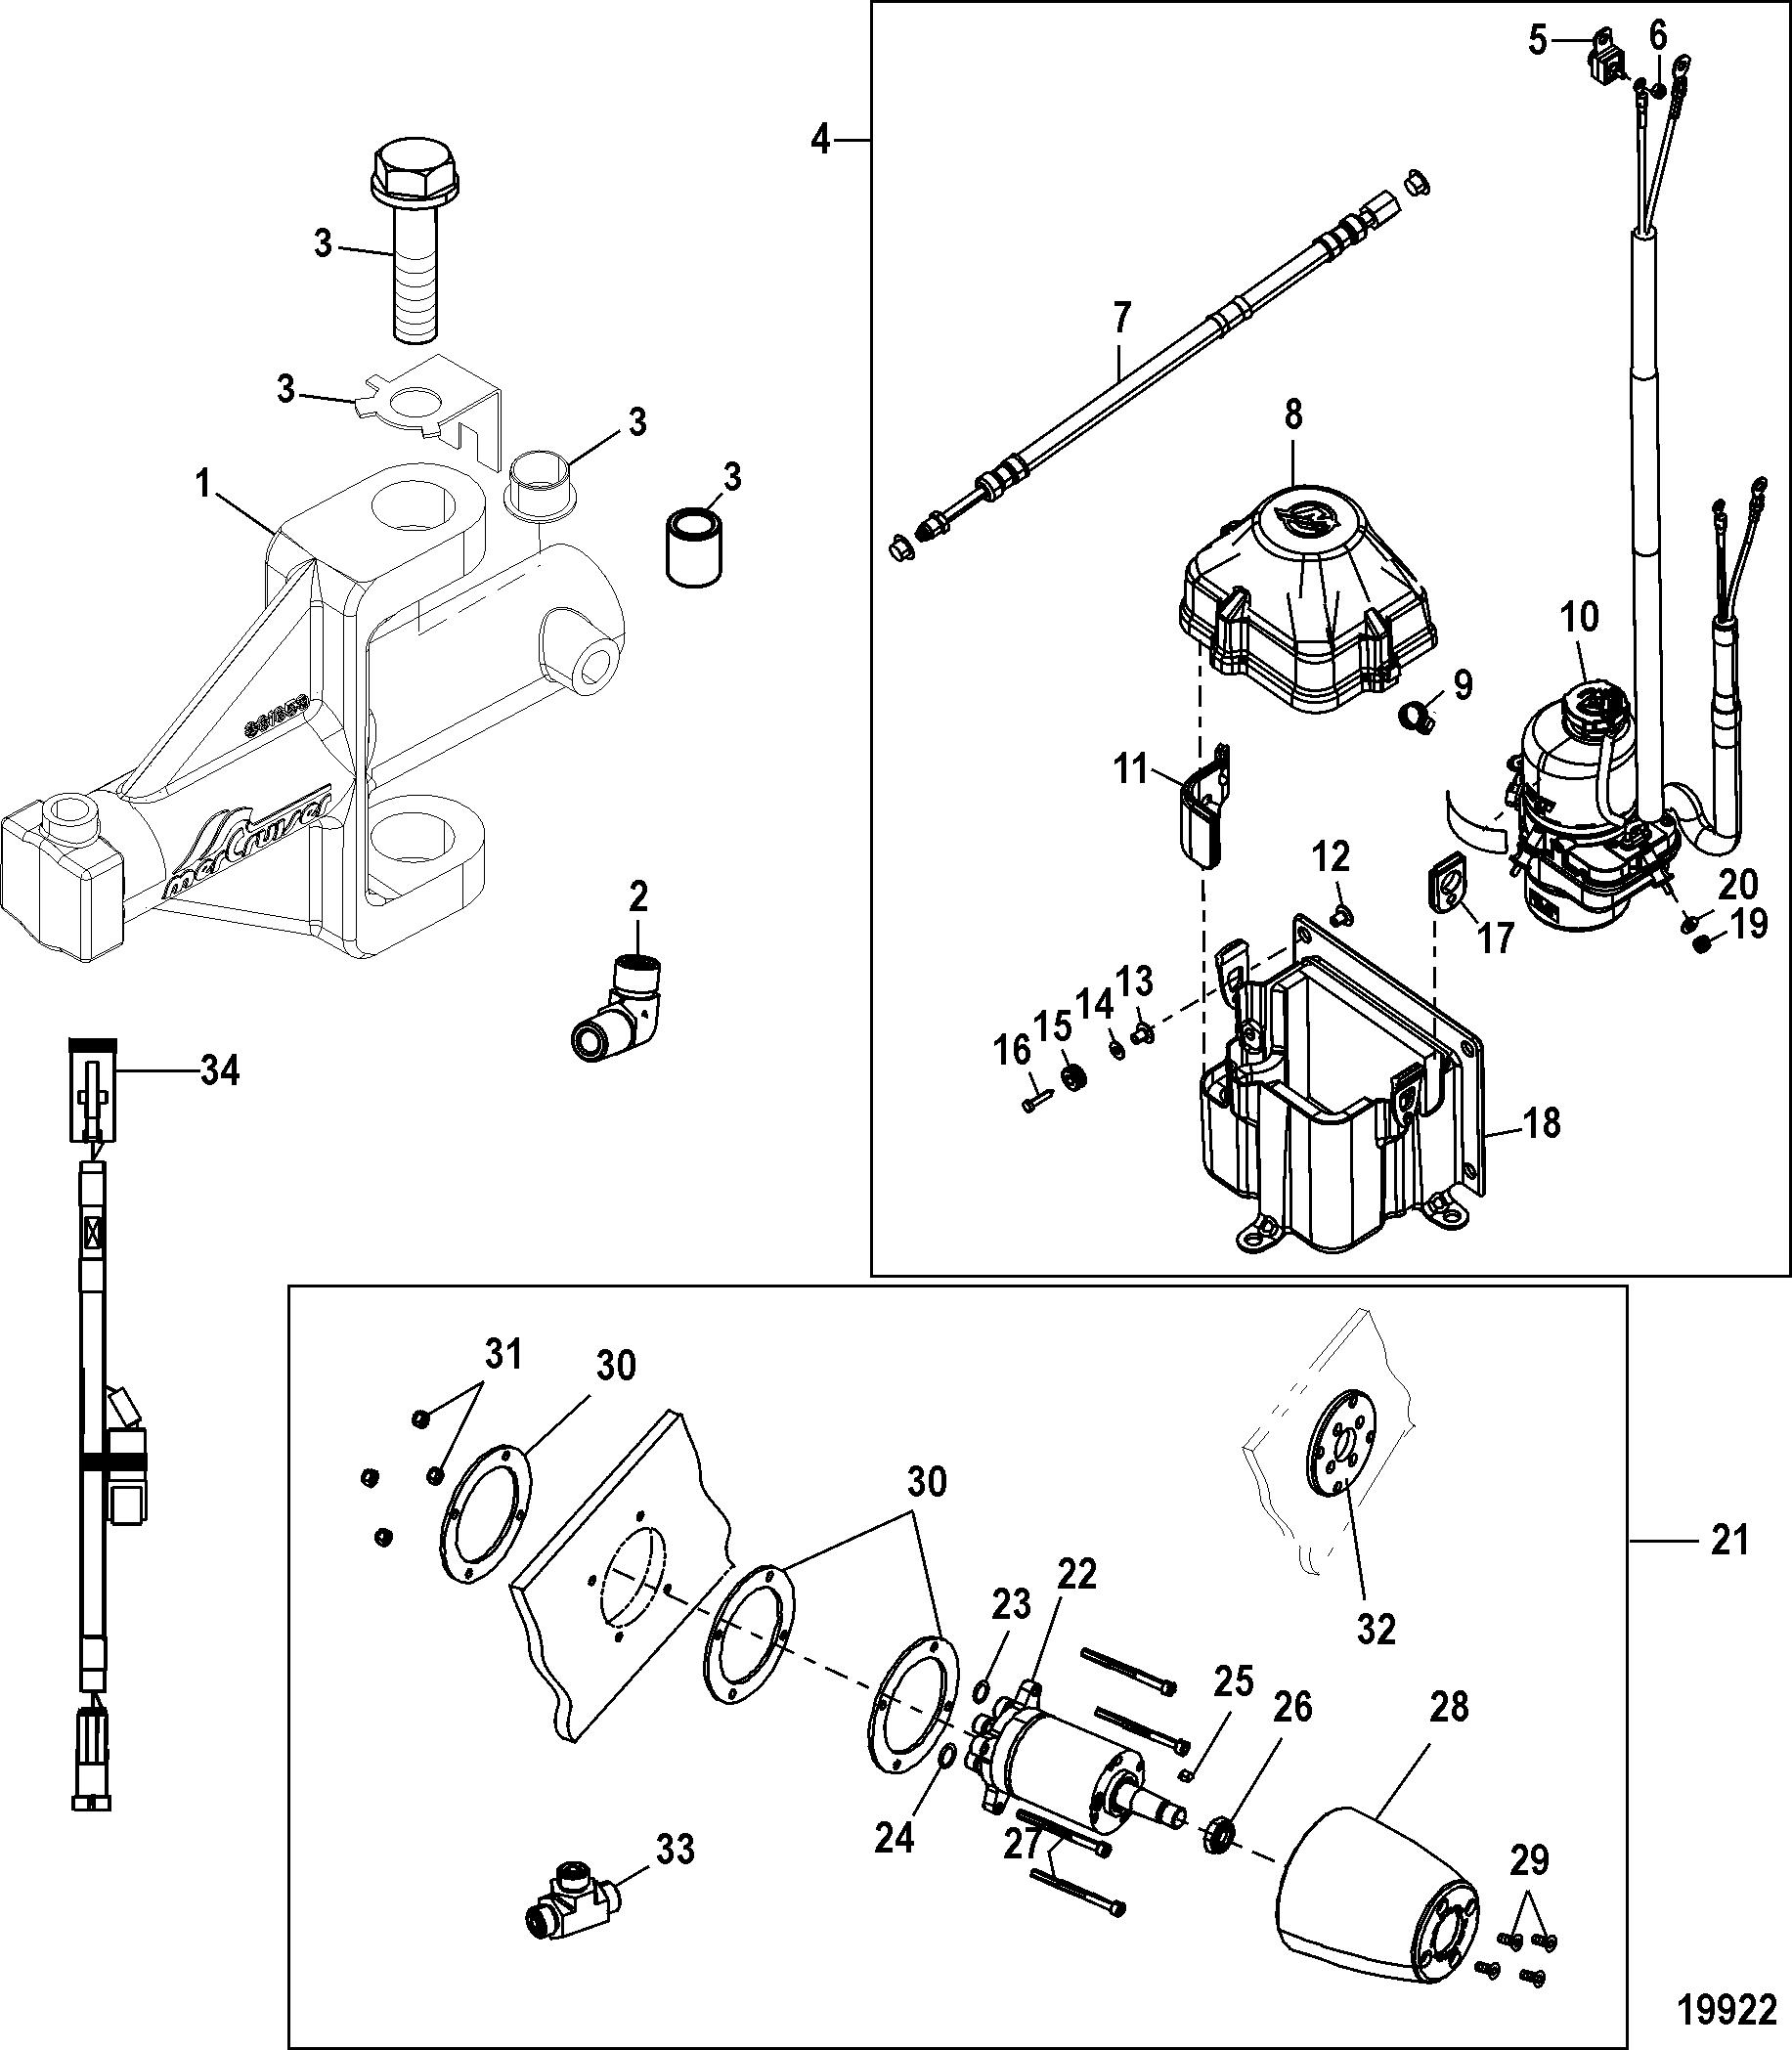 Electro-Hydraulic Power Steering Kit FOR MERCRUISER BRAVO